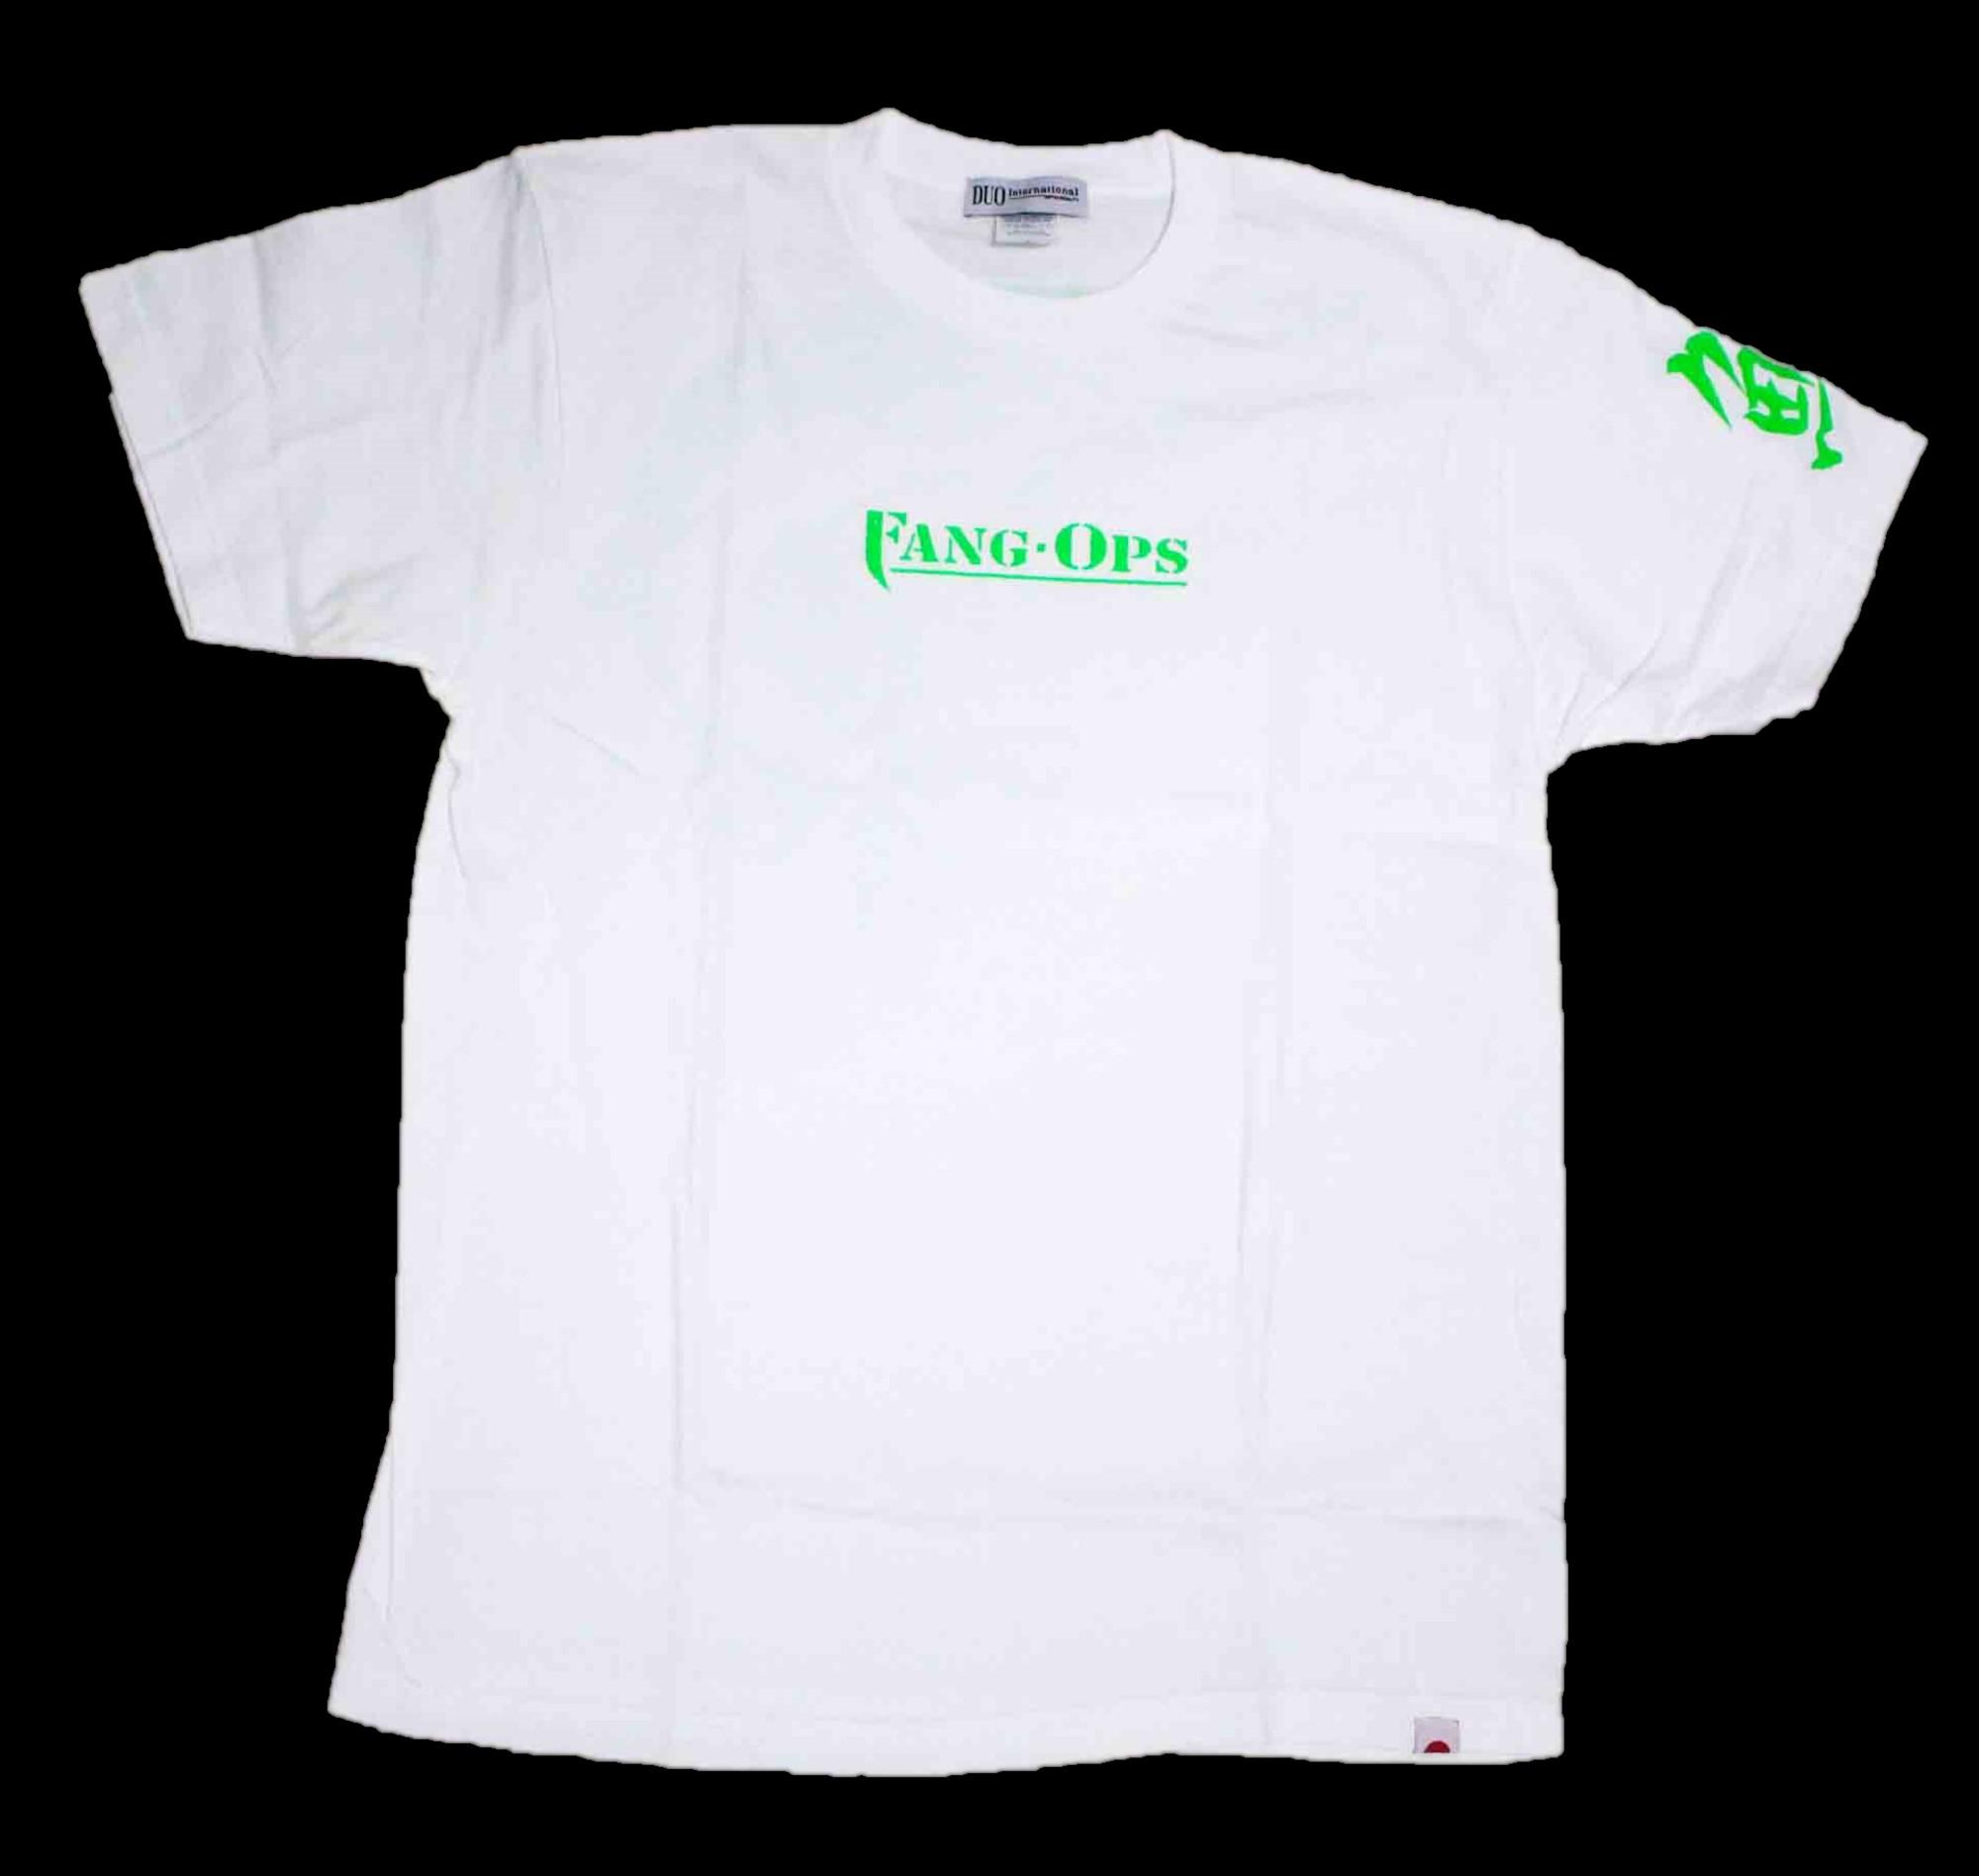 Duo T Shirt Fang Ops Beast Pike Short Sleeve Cotton White Size L (1539)